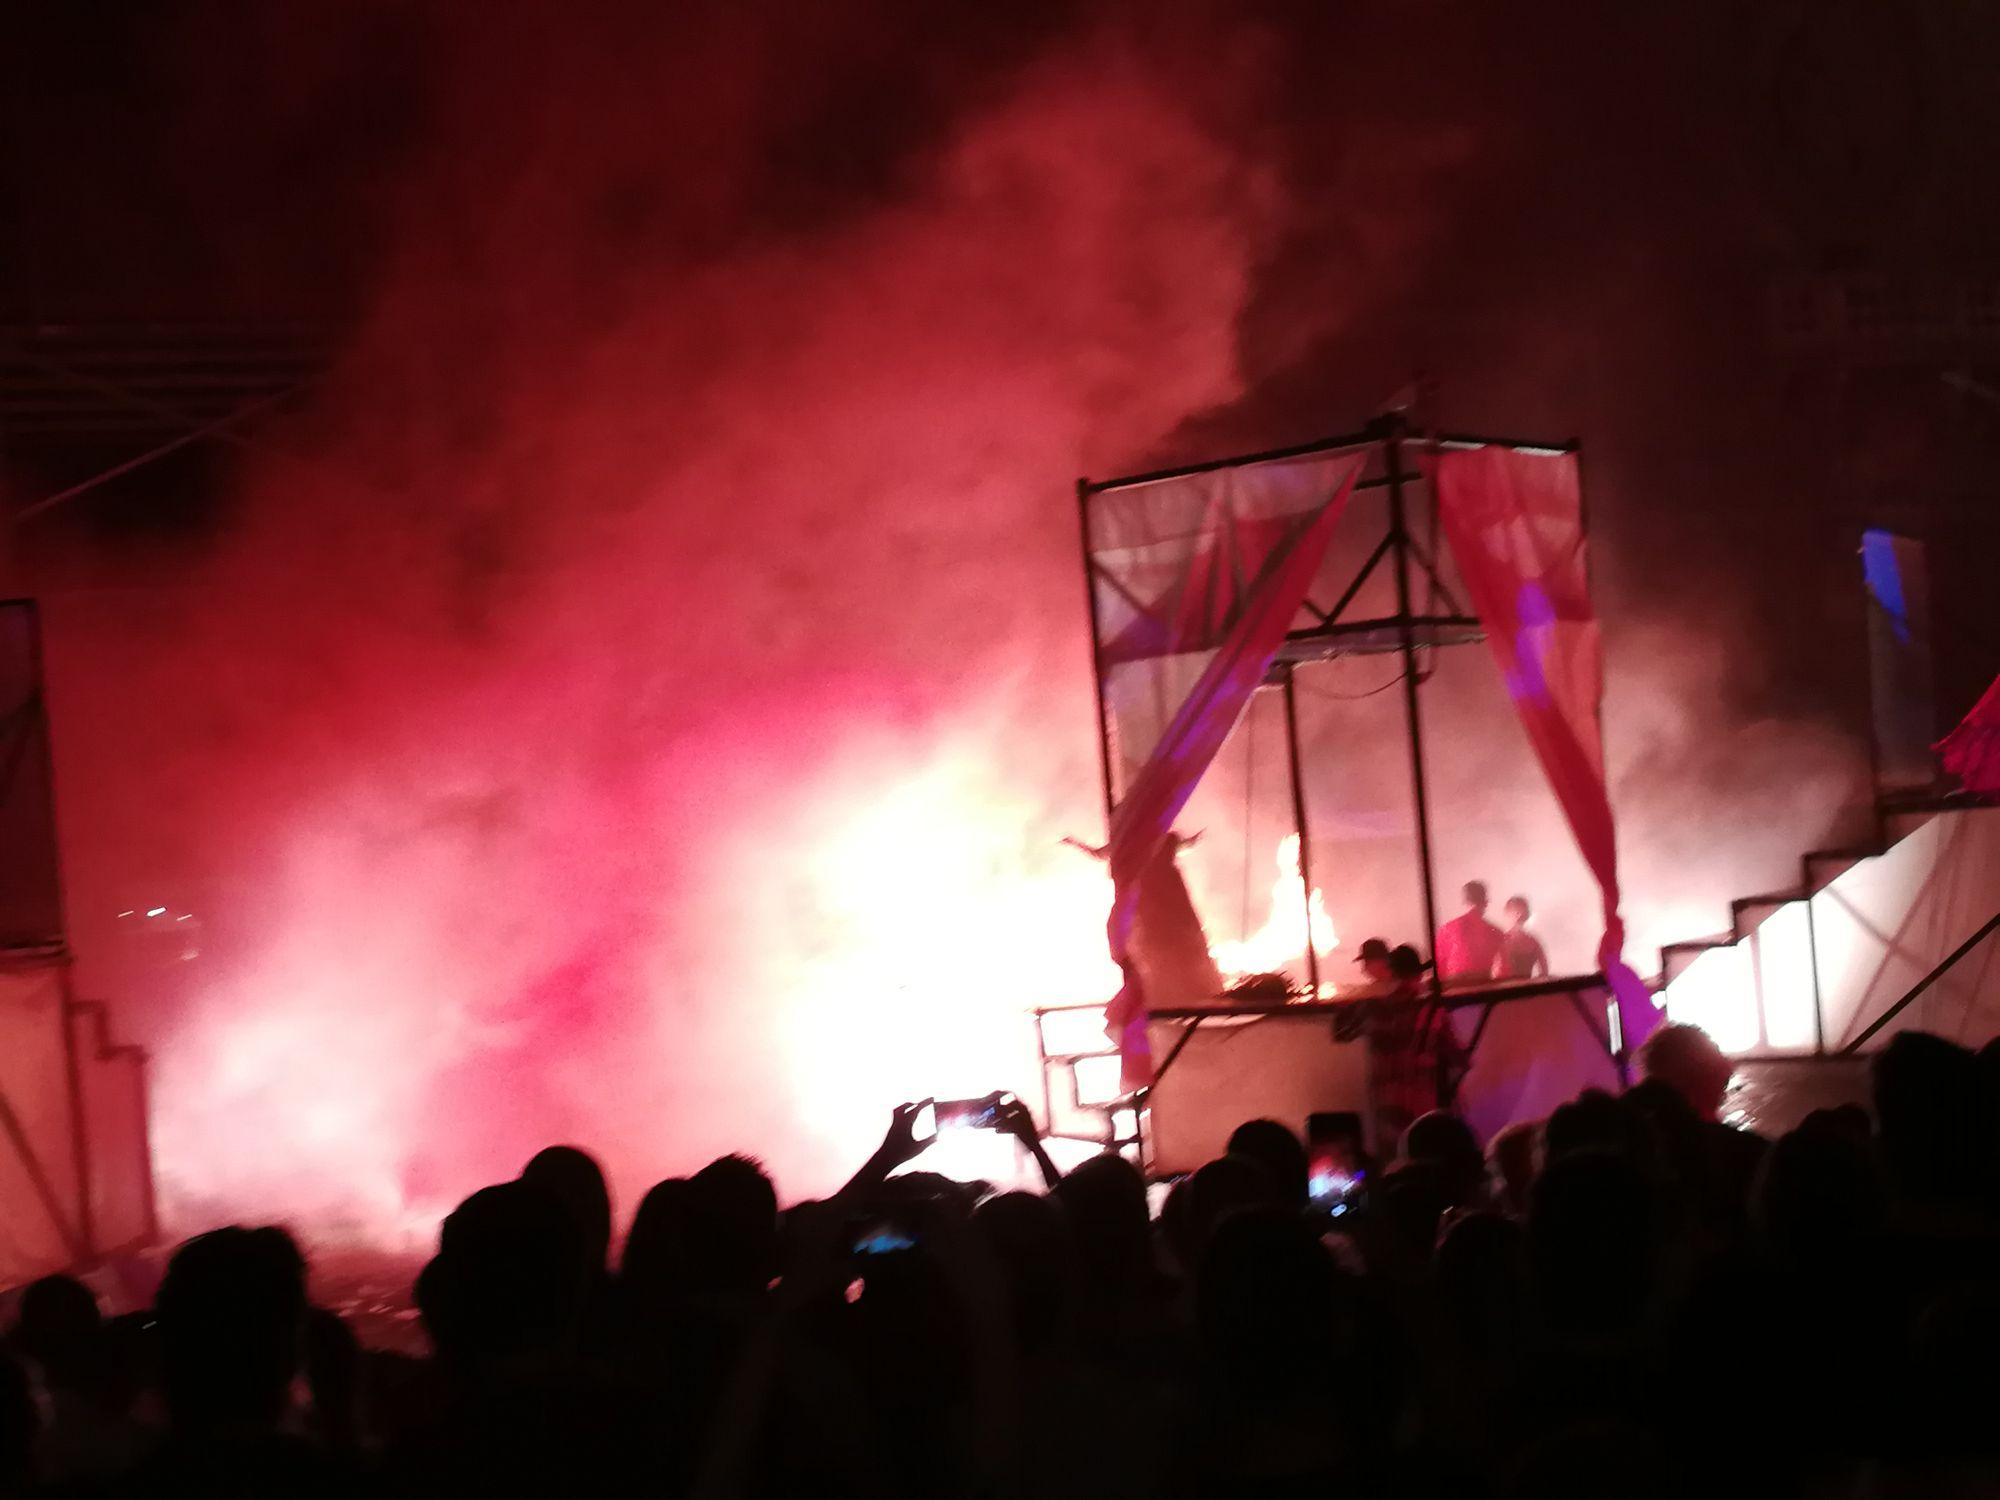 Fantasmagorie in piazza, Mantova